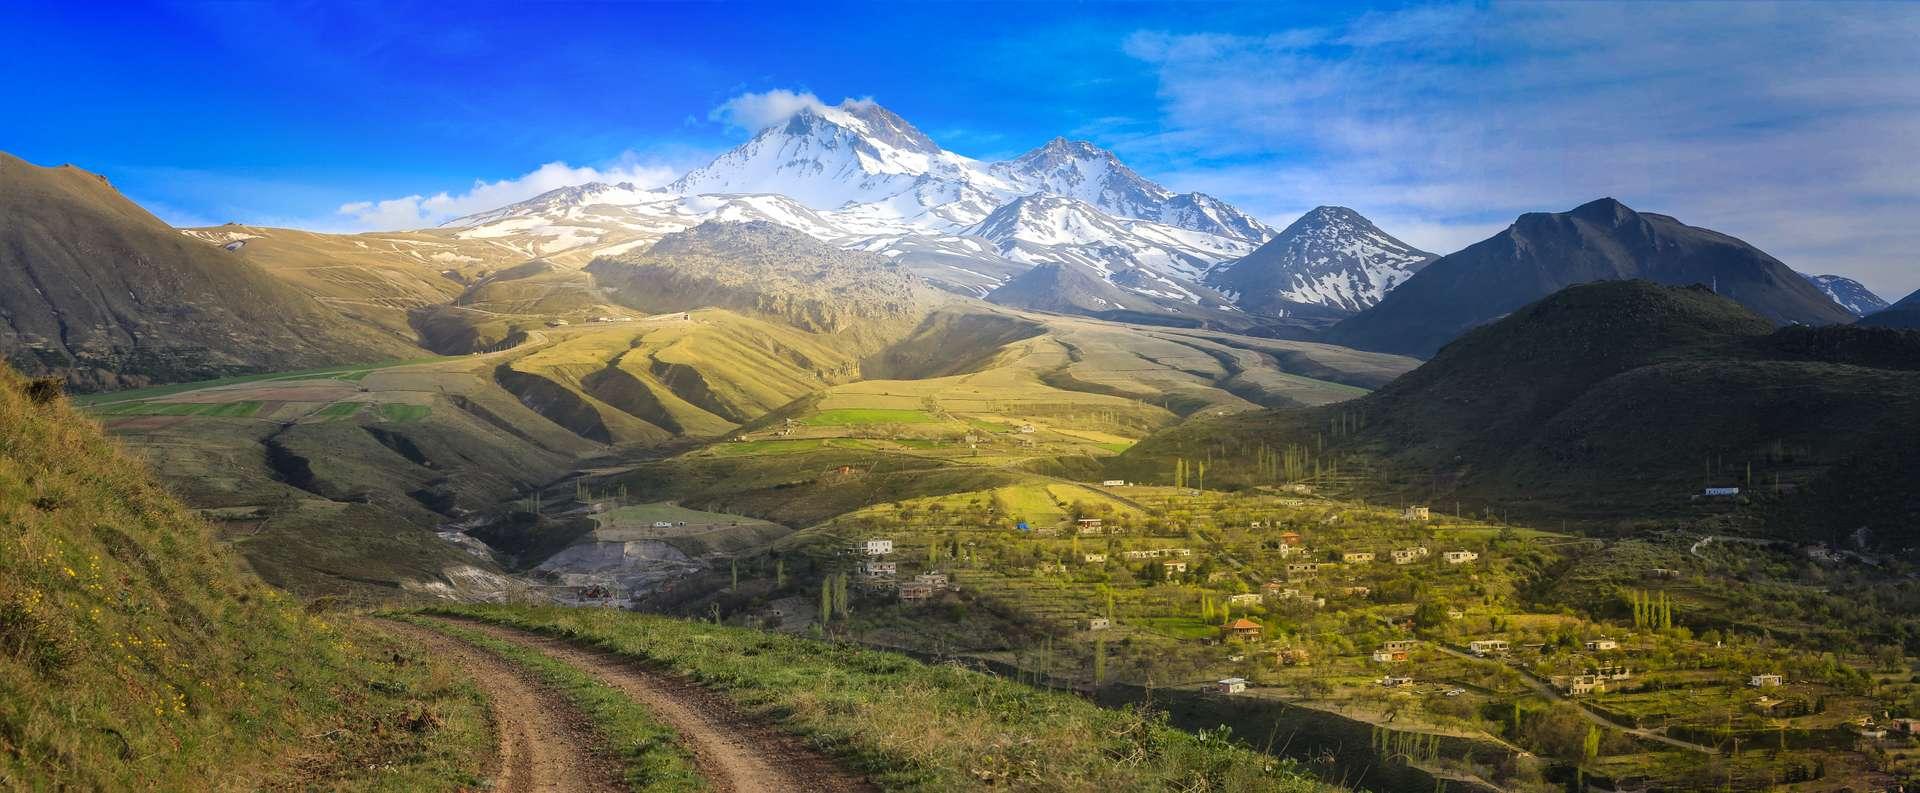 Turkije Kayseri Volcanic mountain Erciyes